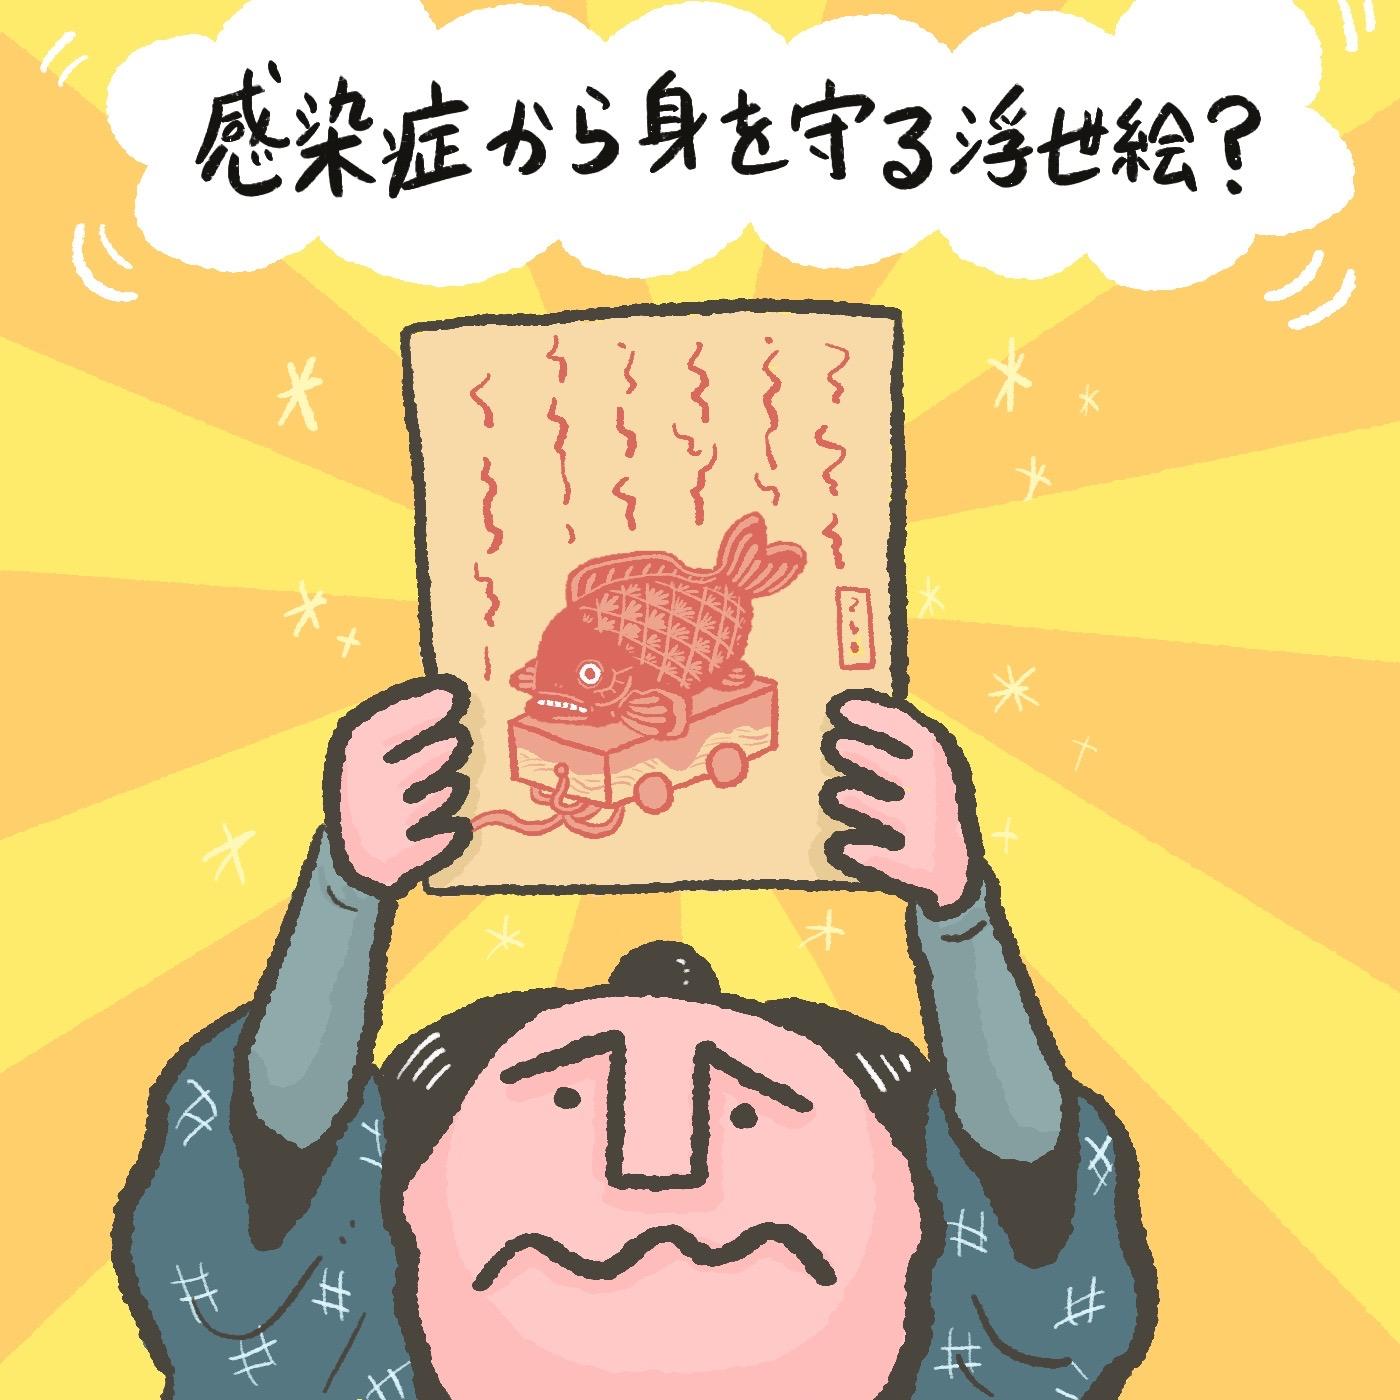 ナニソレ OBIKAKE 浮世絵 麻疹絵 疱瘡絵